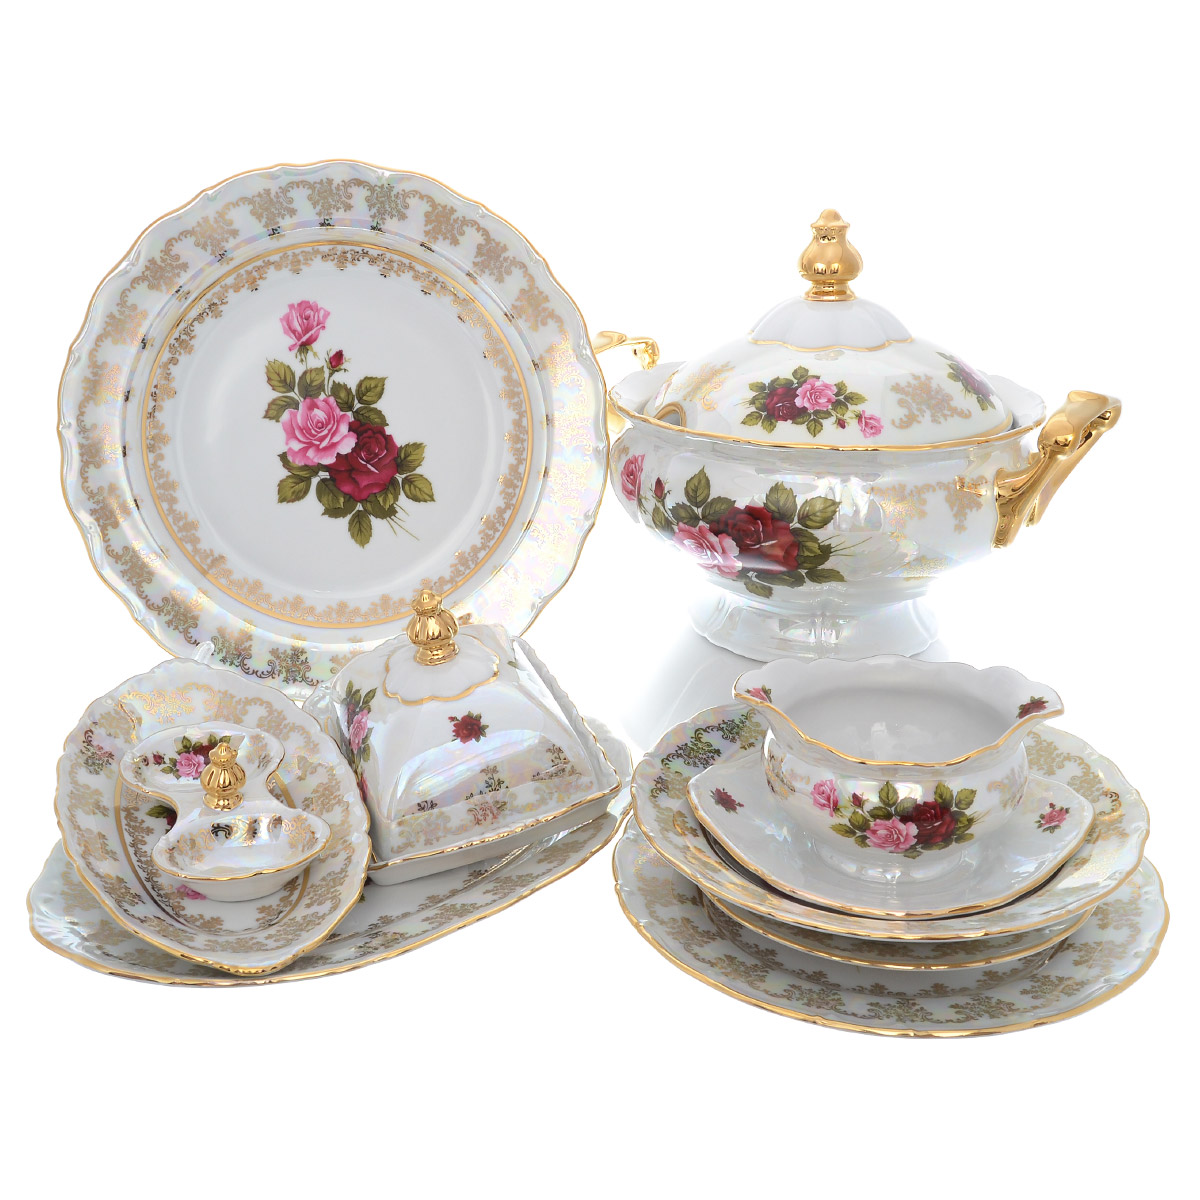 Столовый сервиз РОЗА ПЕРЛАМУТР от Queens Crown (Prince Porcelain) на 6 персон, 27 предметов, фарфор